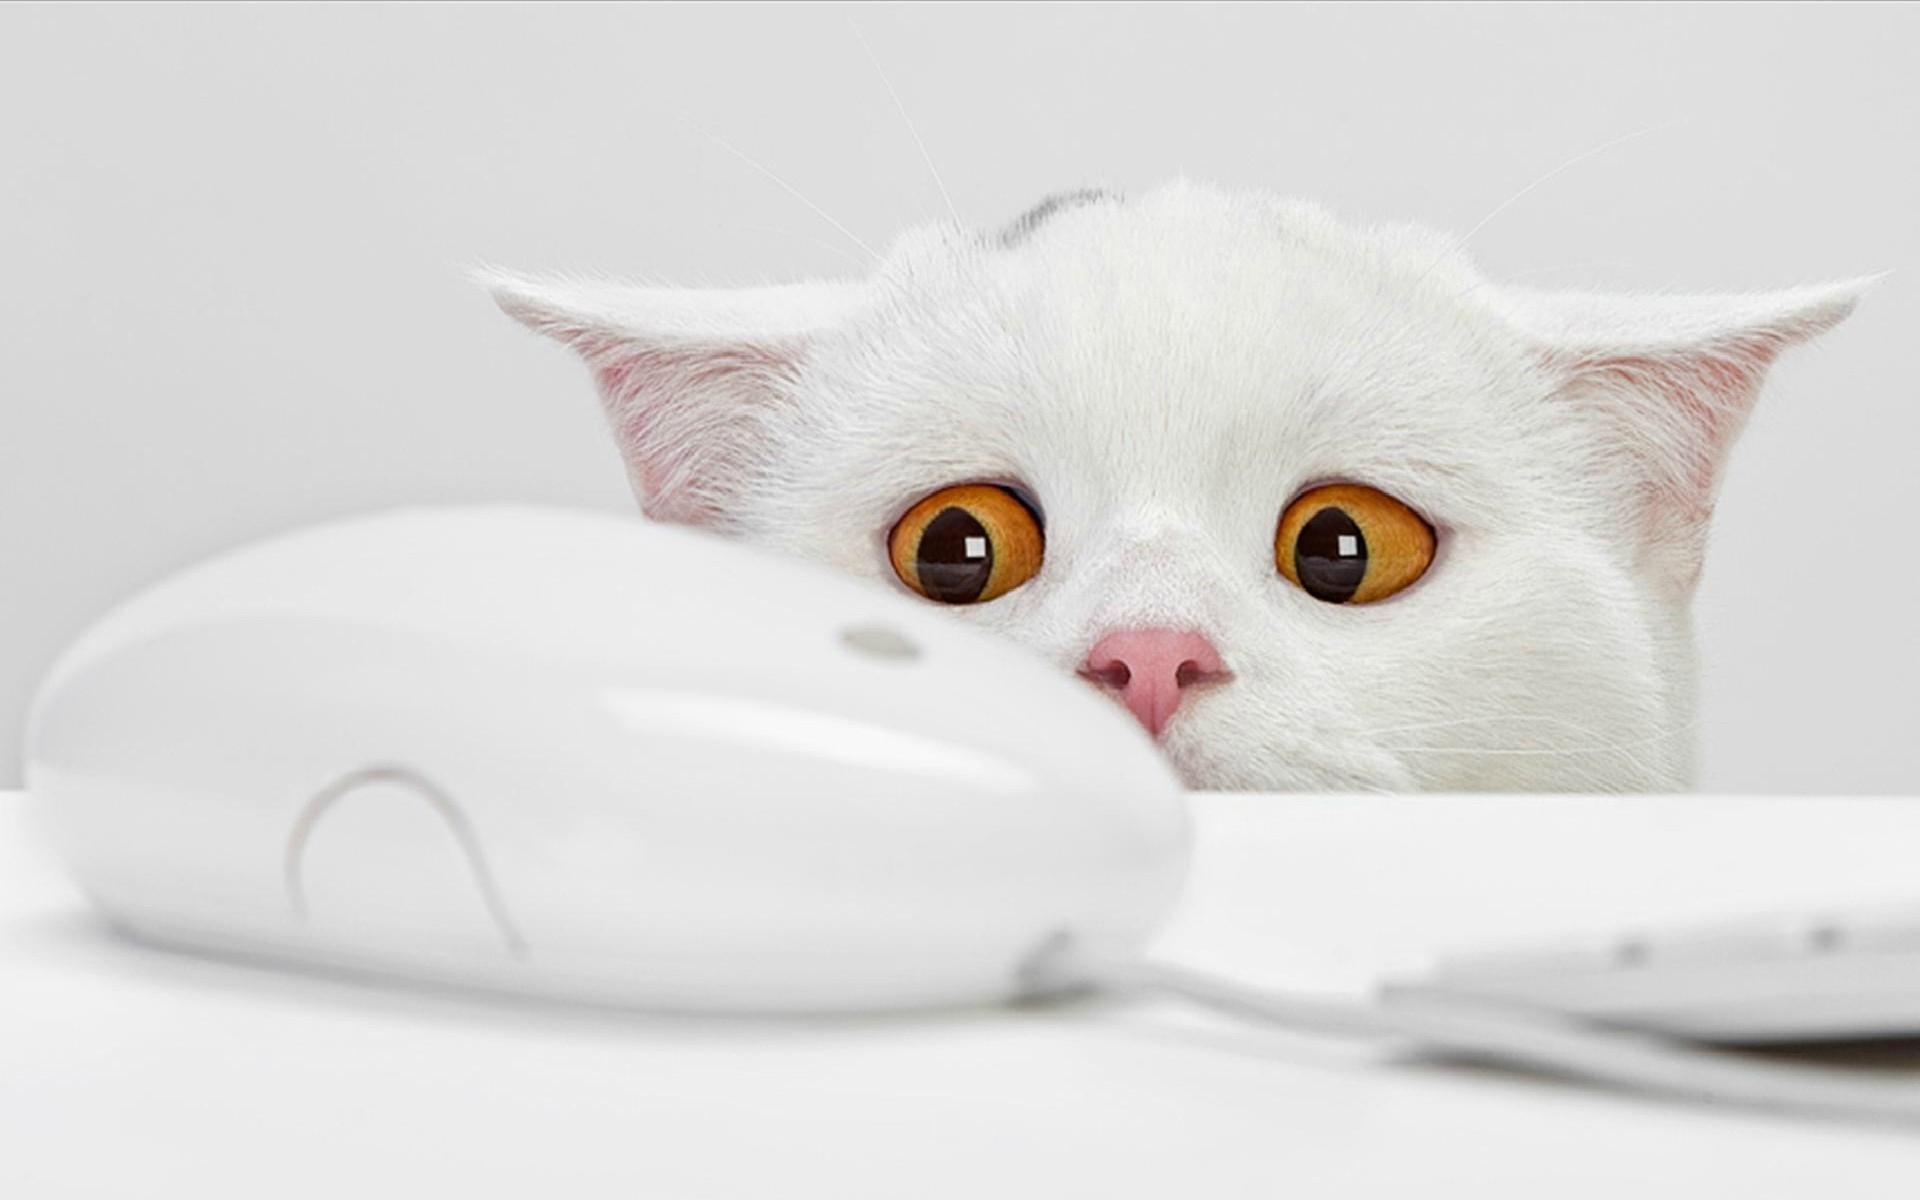 Handy-Wallpaper Humor, Tiere, Katzen kostenlos herunterladen.